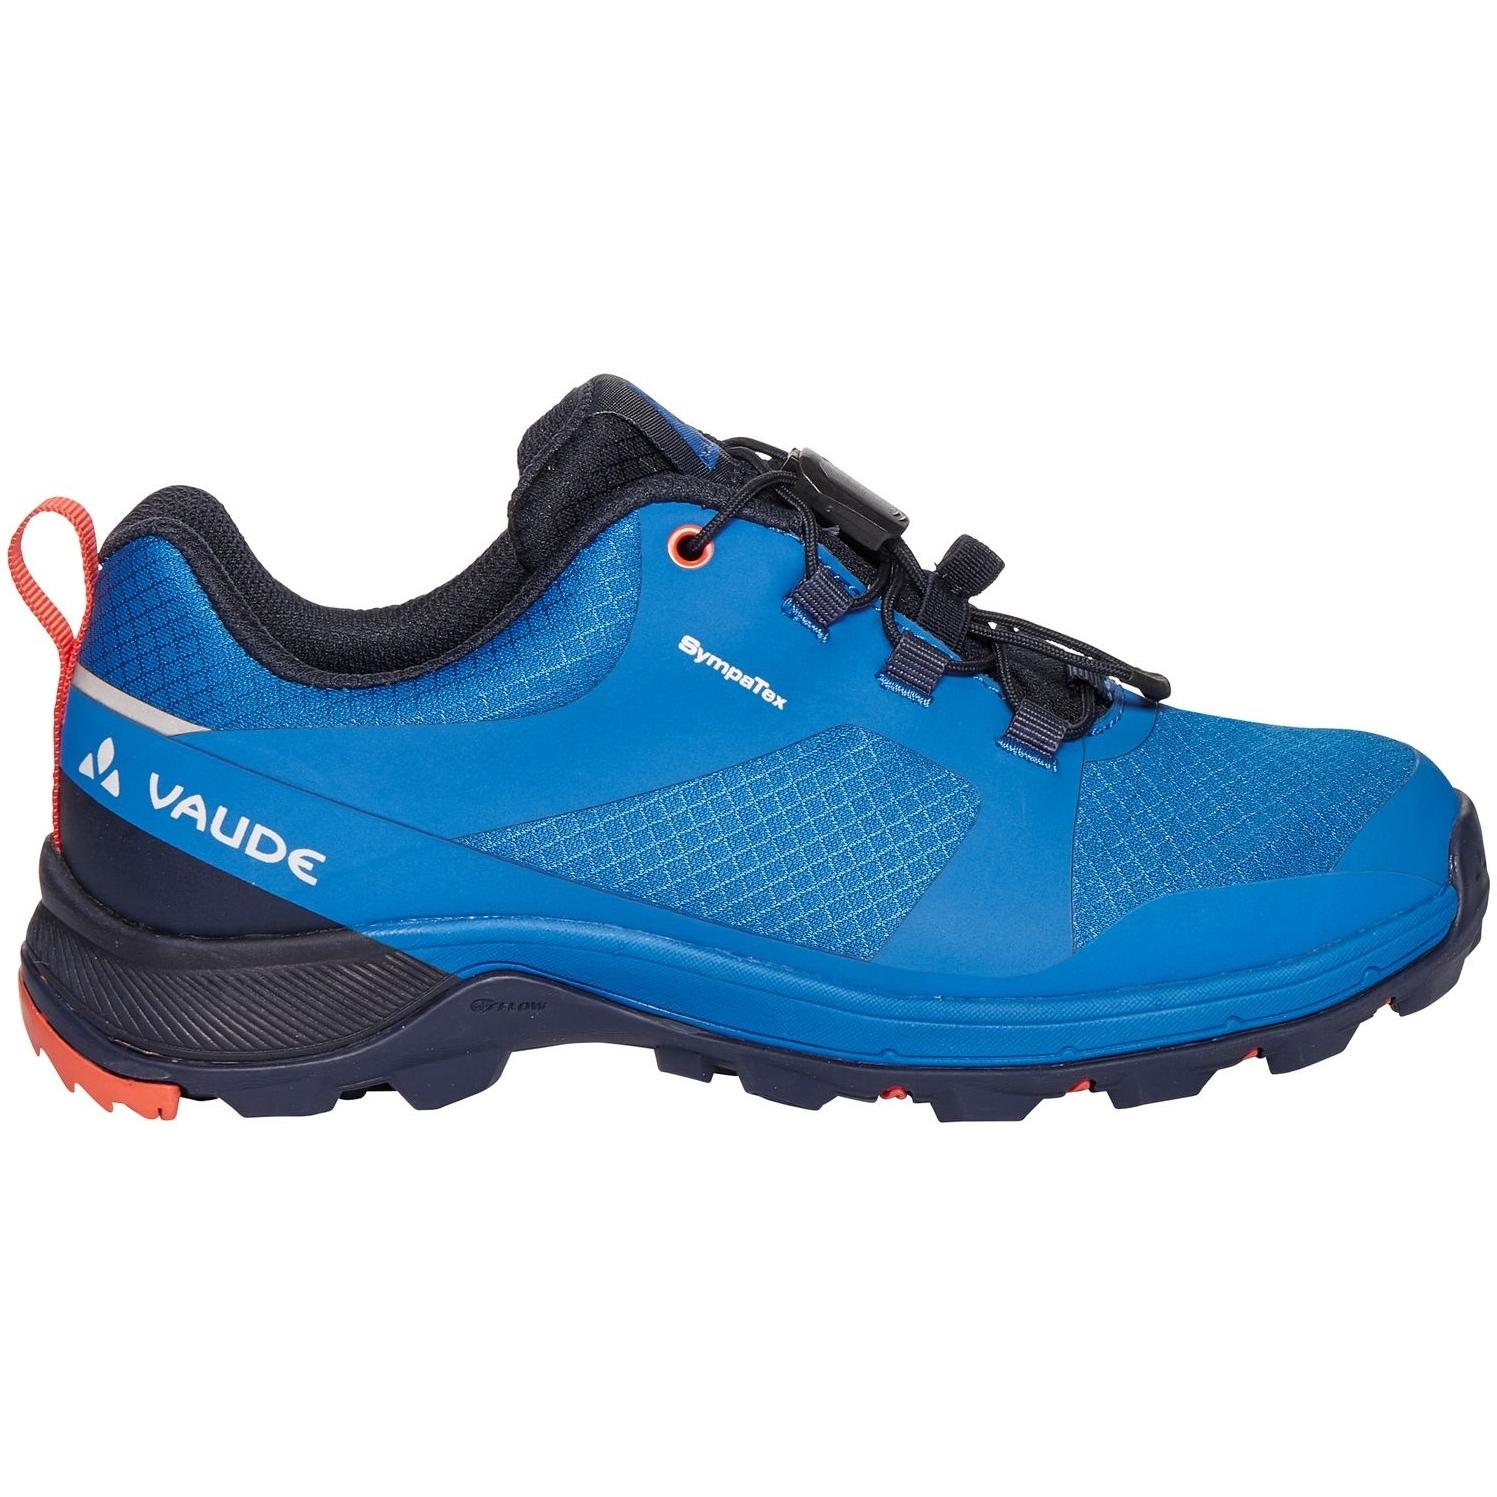 Vaude Kids Lapita II Low STX Shoes - radiate blue